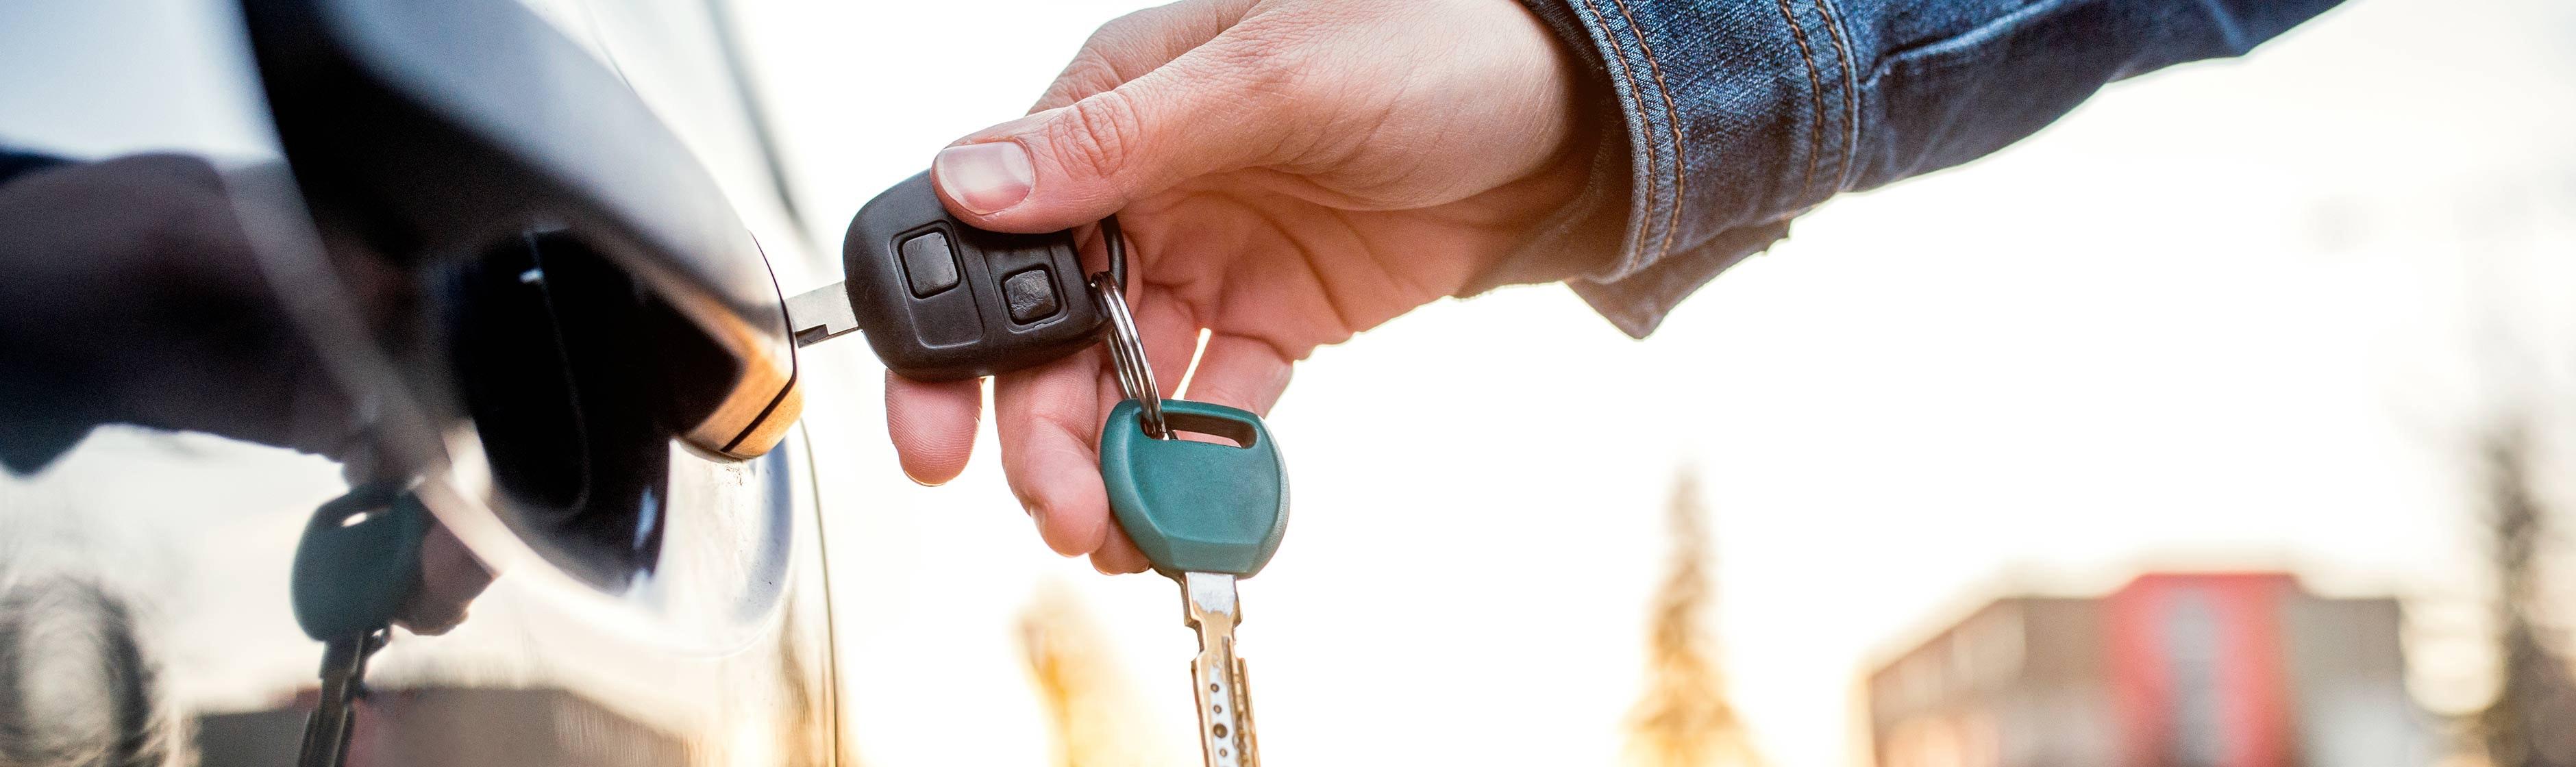 Auto met sleutel openmaken